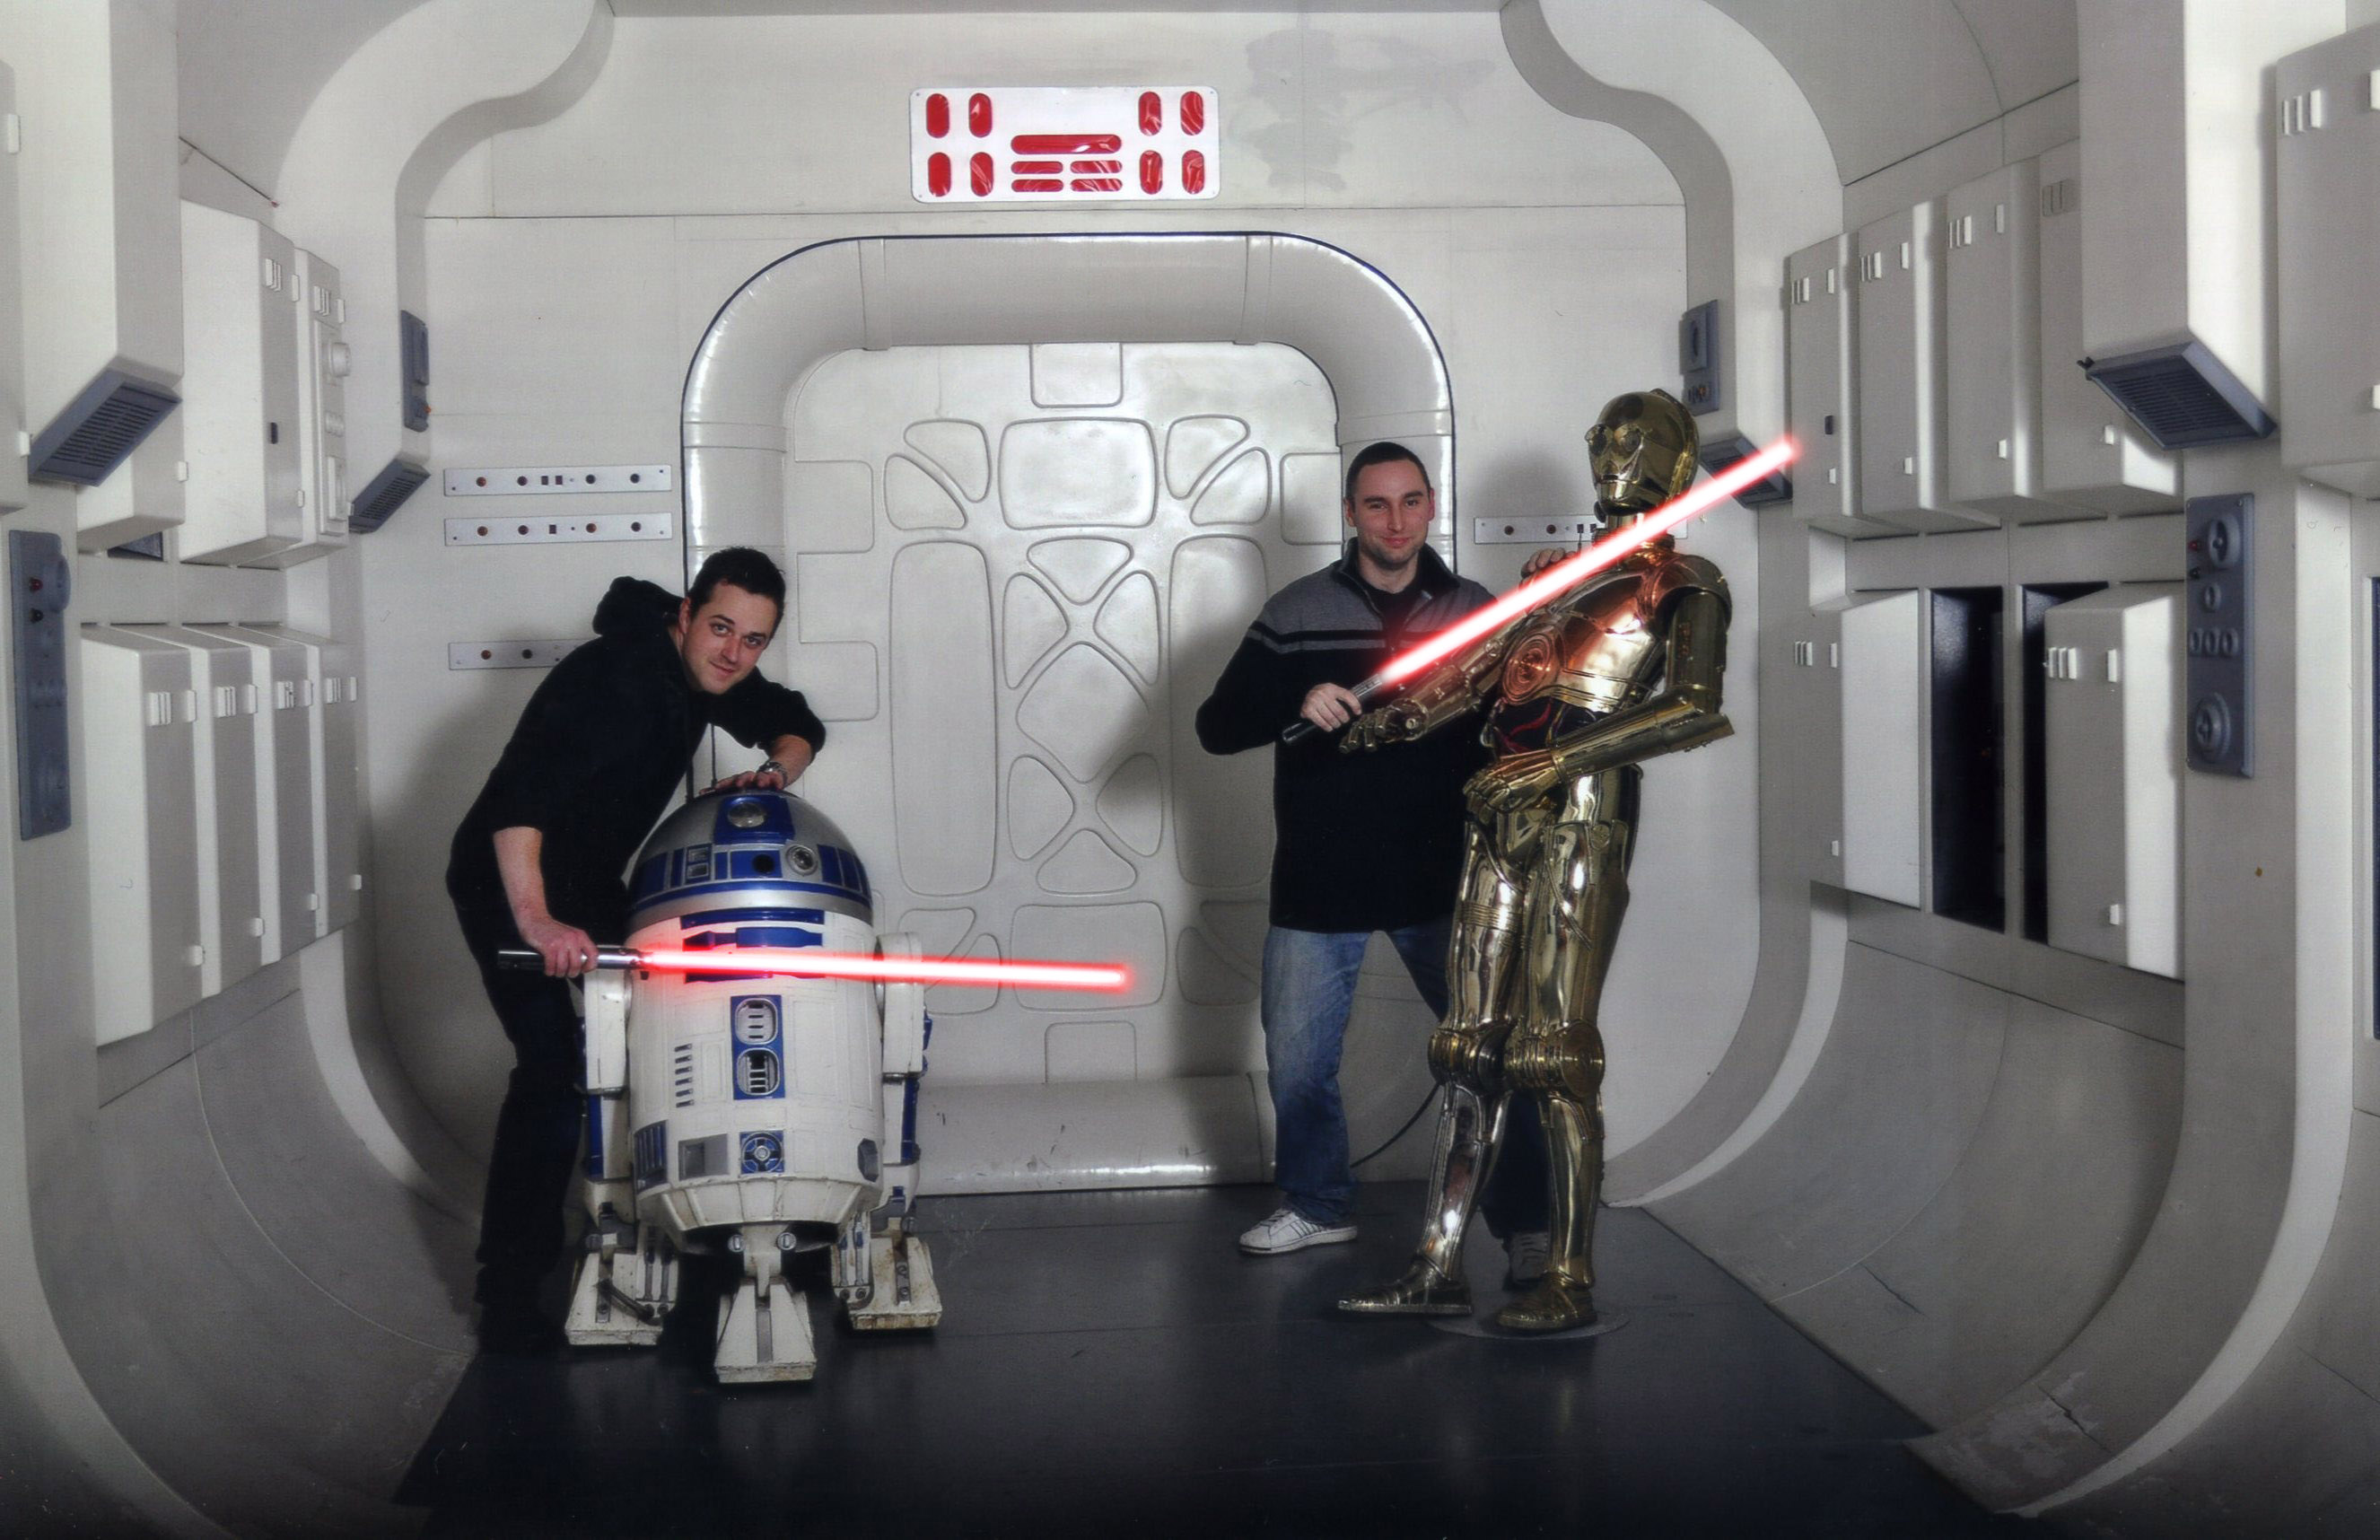 Rebel blockade runner the tantive iv beyond the movies for Star wars museum california